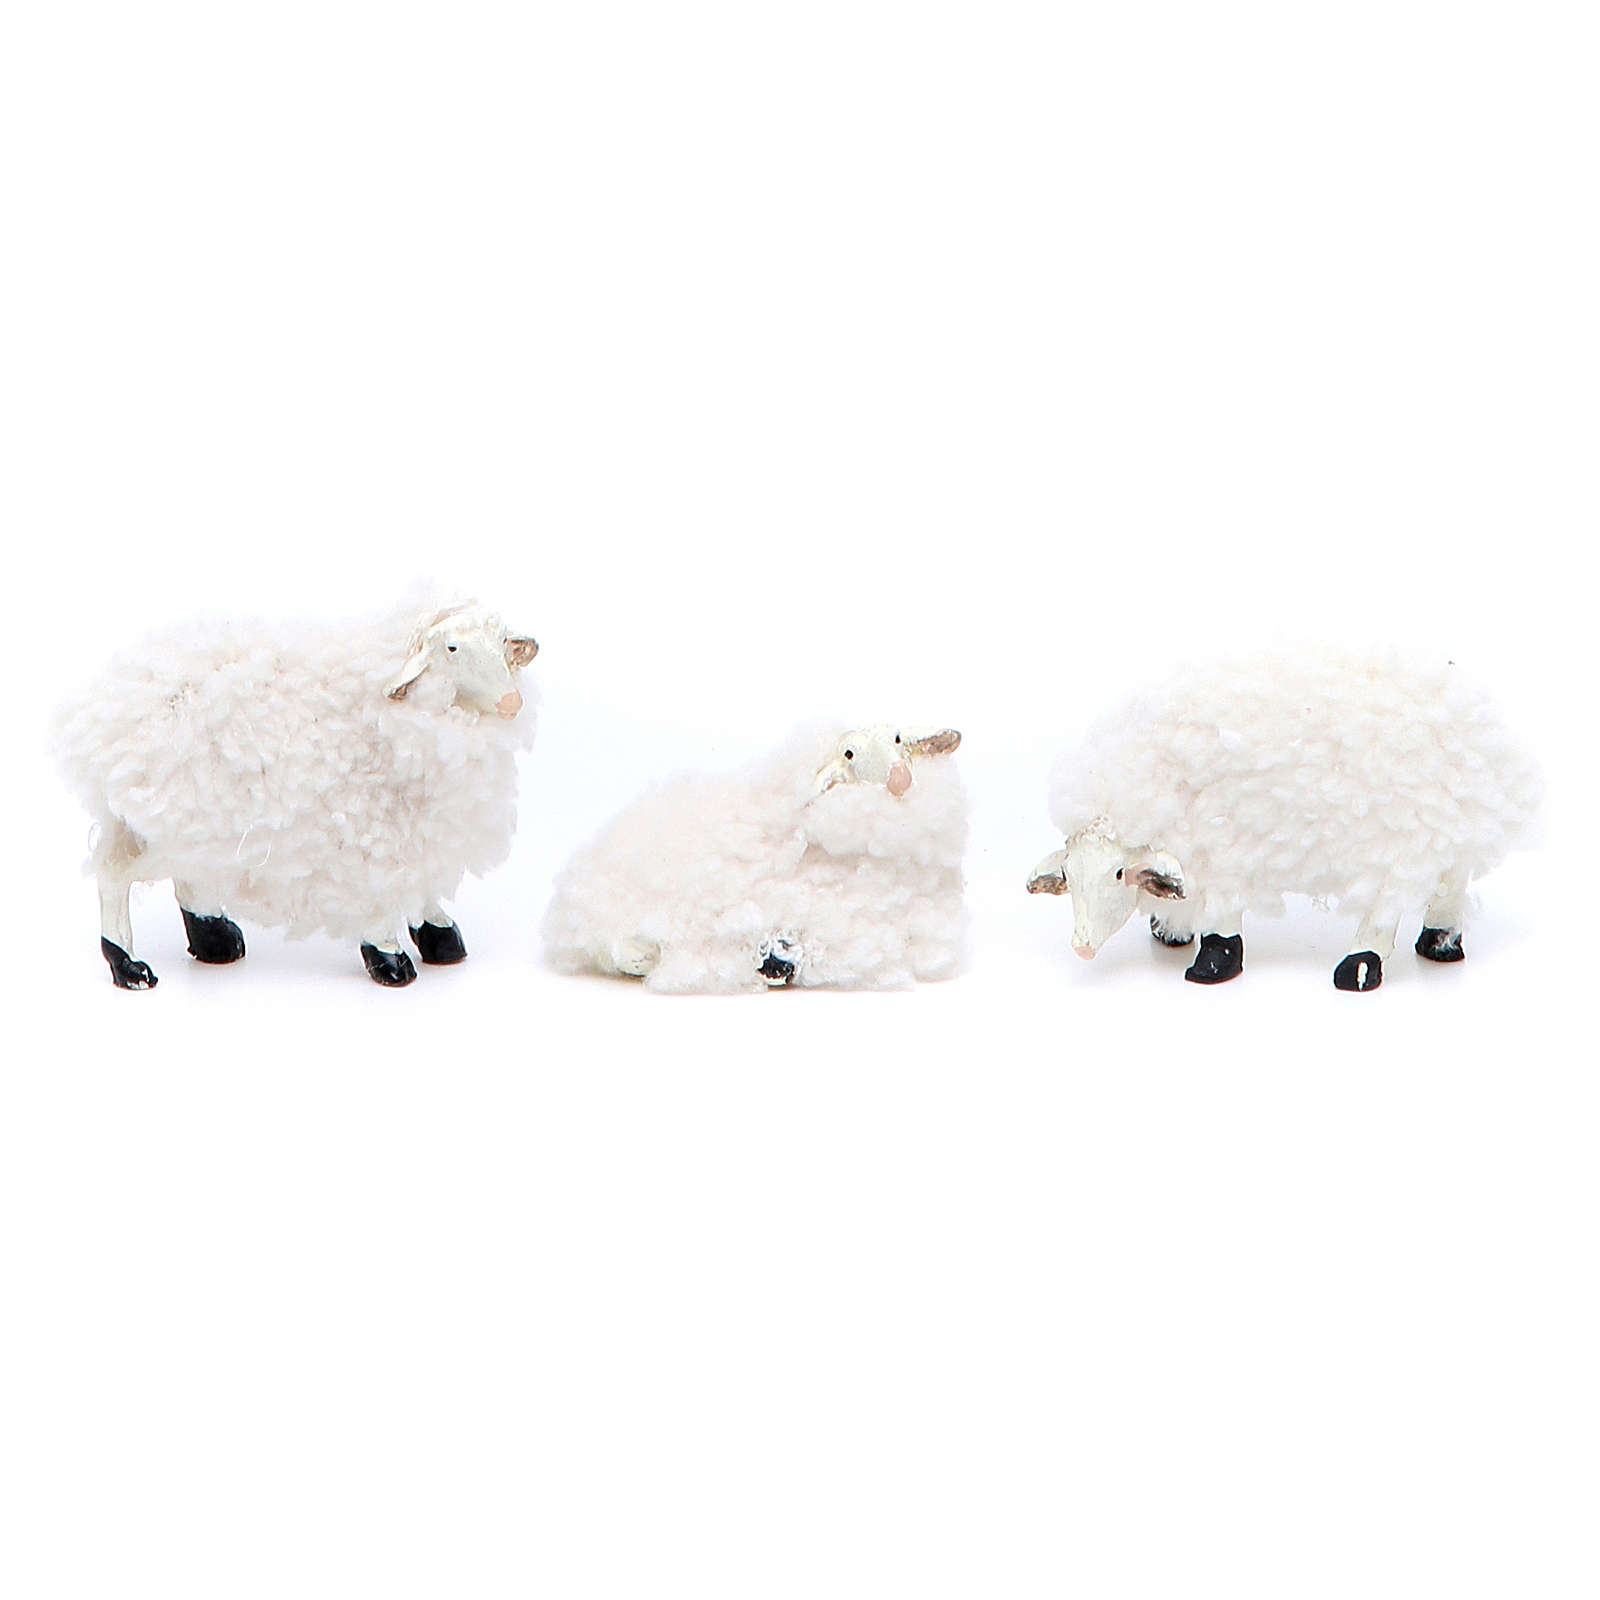 Agnello resina e lana 10 cm 6 pezzi 3